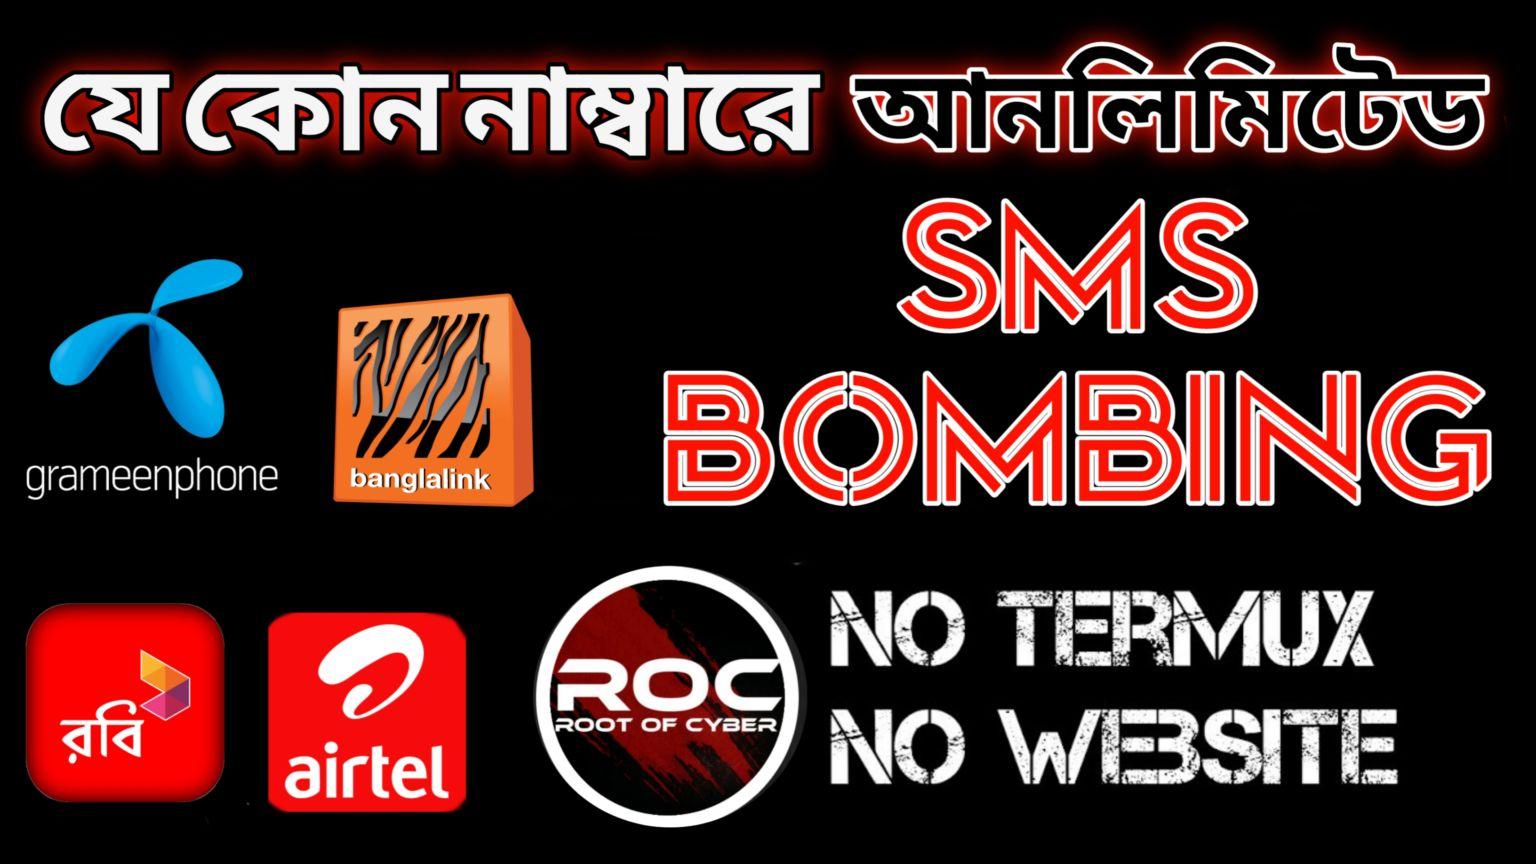 [ROC-X:13] Android App দিয়ে আনলিমিটেড SMS Bombing করূন বাংলাদেশি যে কোন নাম্বারে [No Termux, No Website]